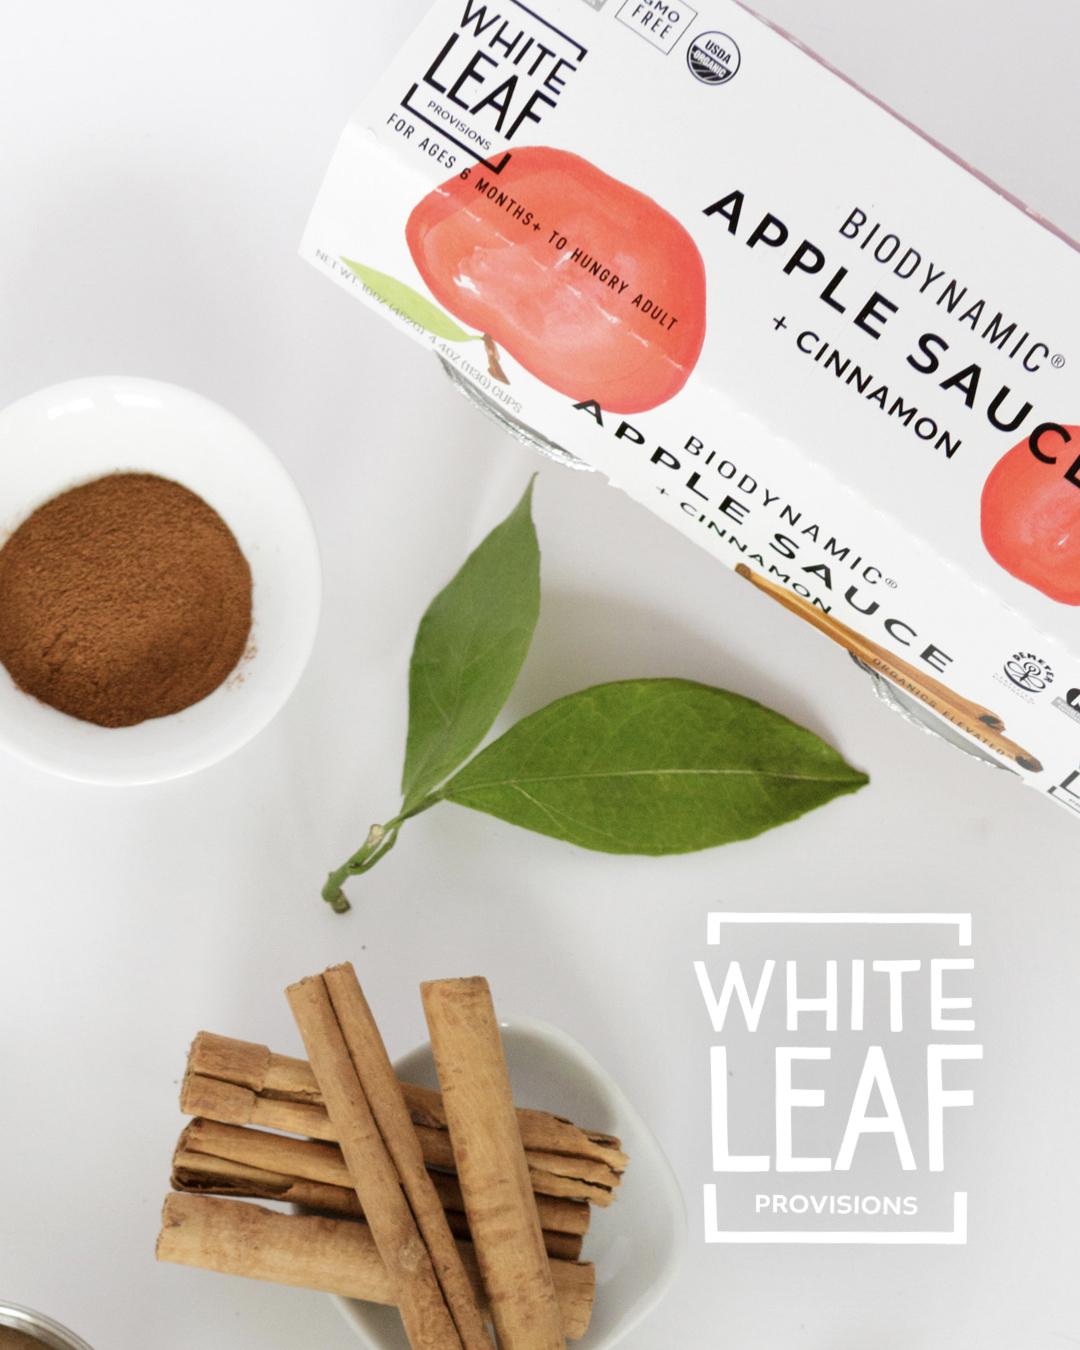 white leaf provisions CDS East 2019.001.jpeg